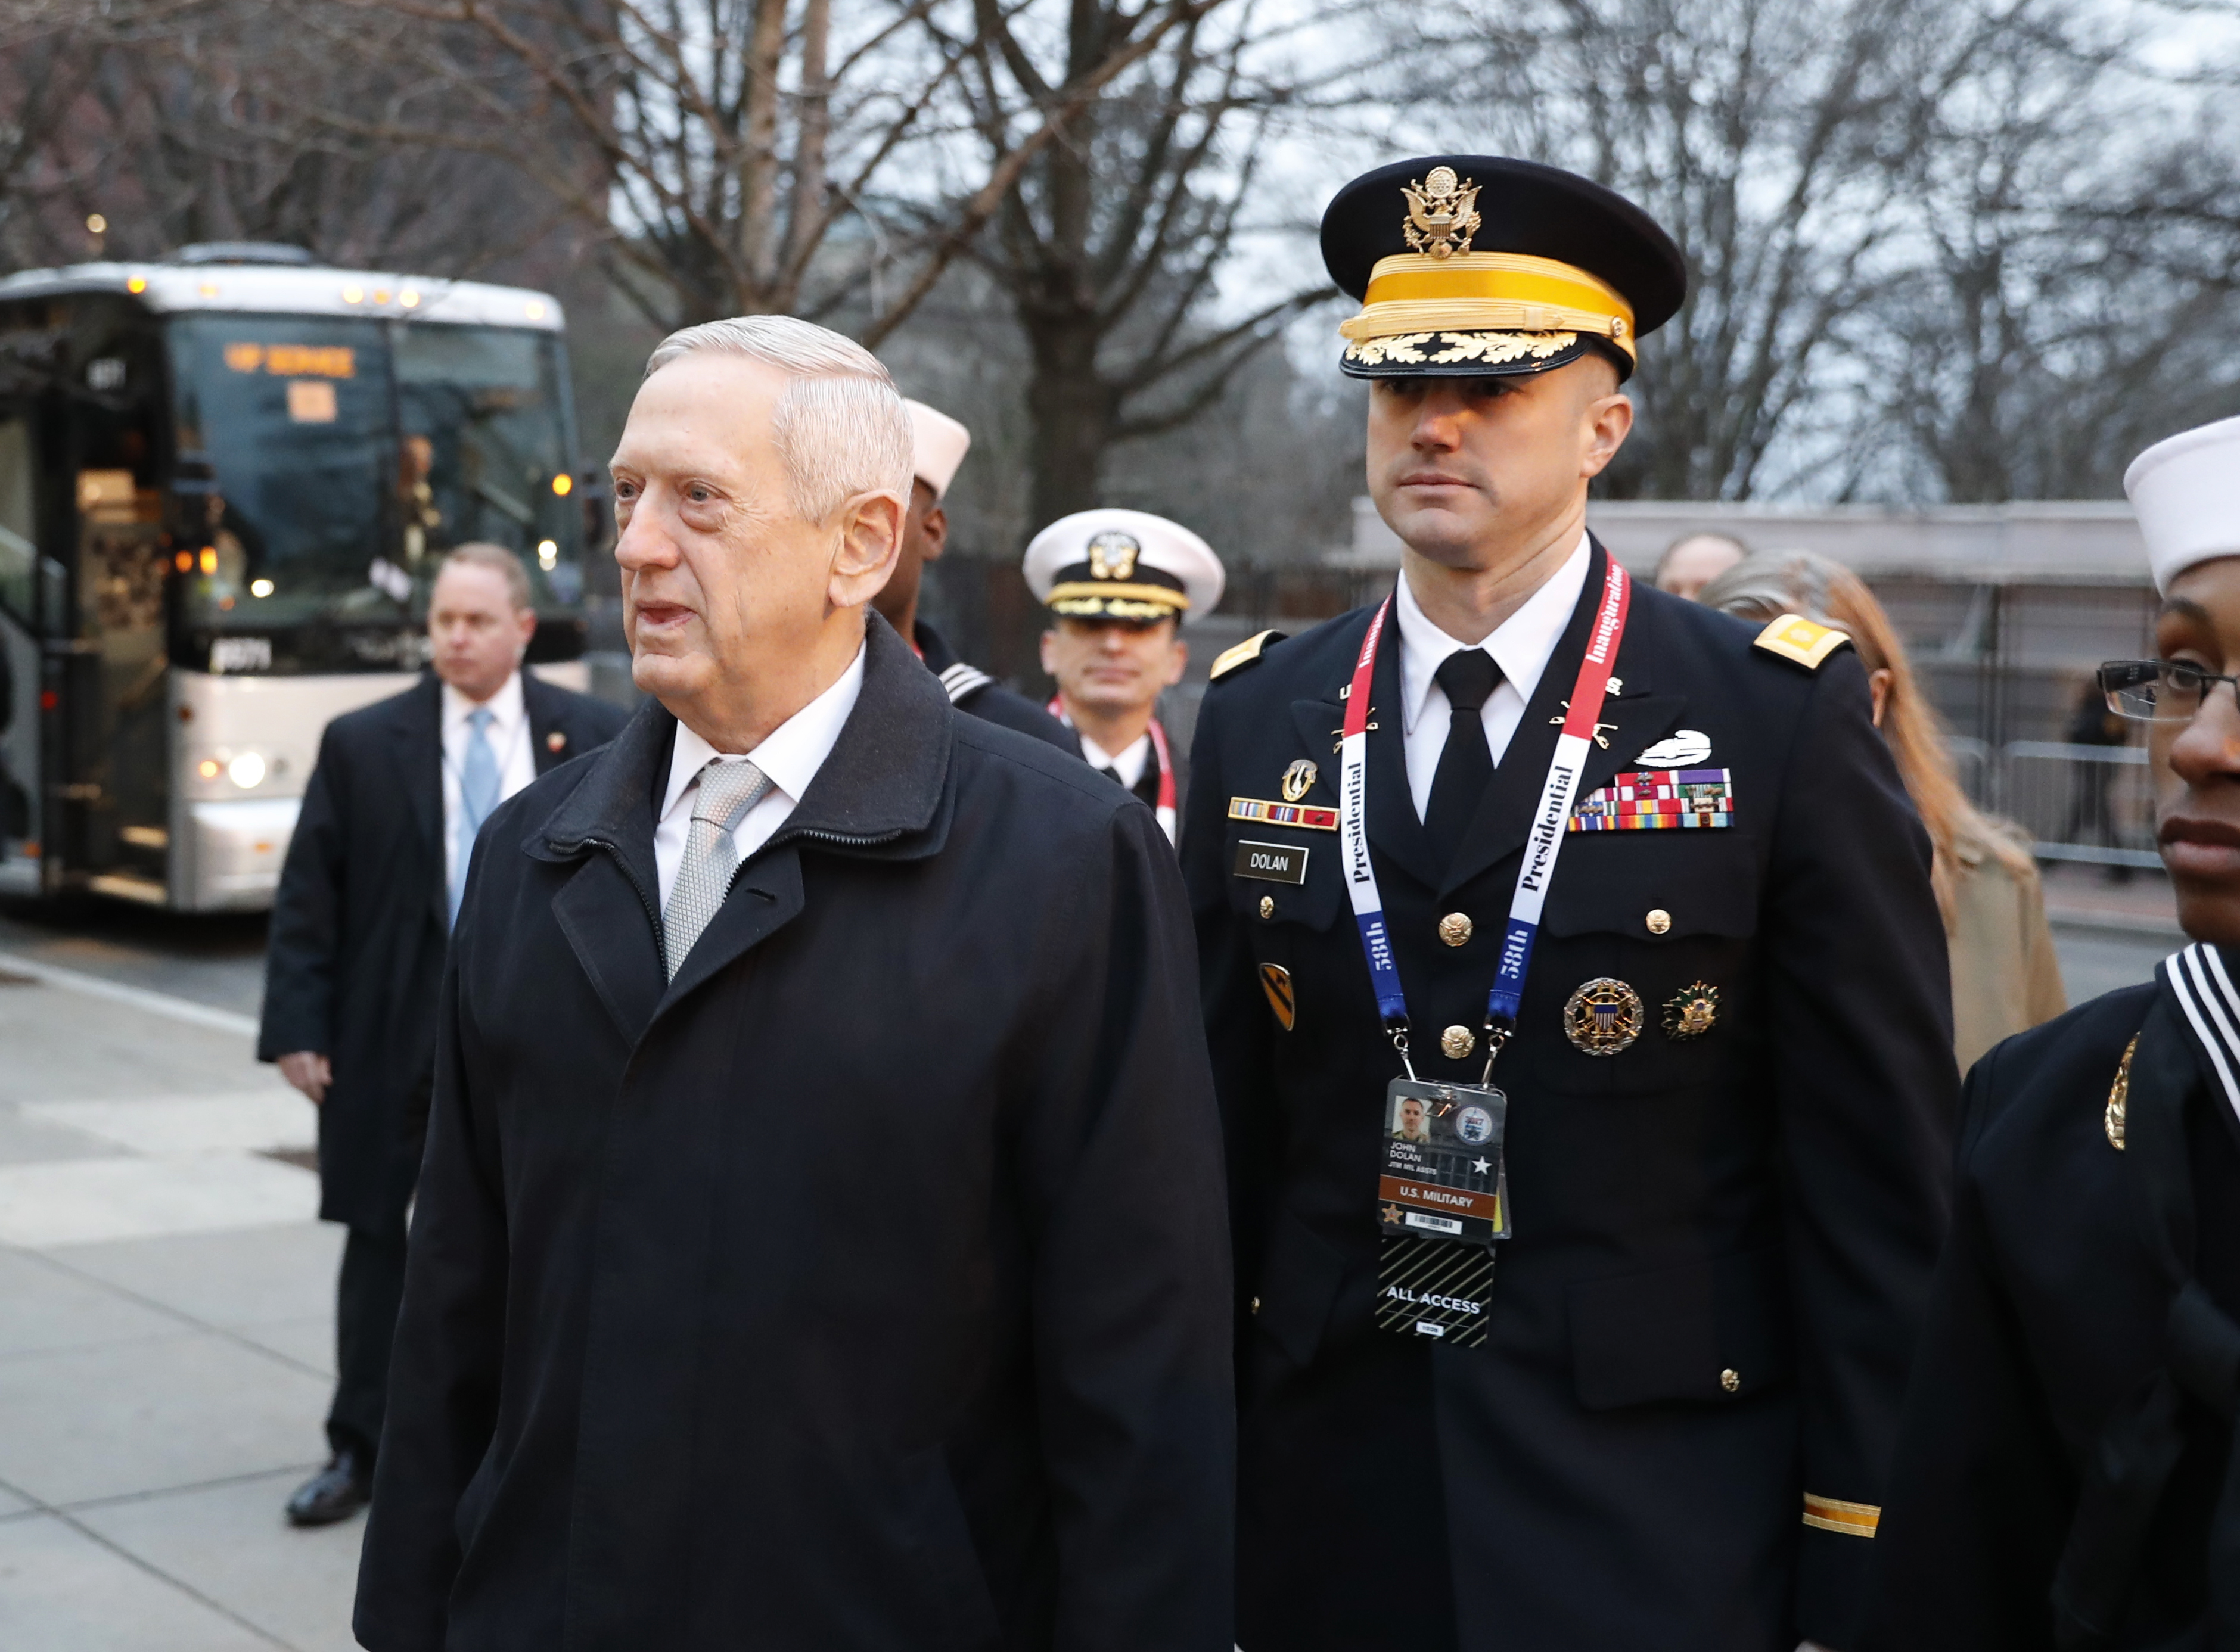 Defense Secretary-designate James Mattis arrives for church service at St. John's Episcopal Church across from the White House in Washington on Jan. 20, 2017, on Donald Trump's inauguration day. (AP Photo/Alex Brandon)